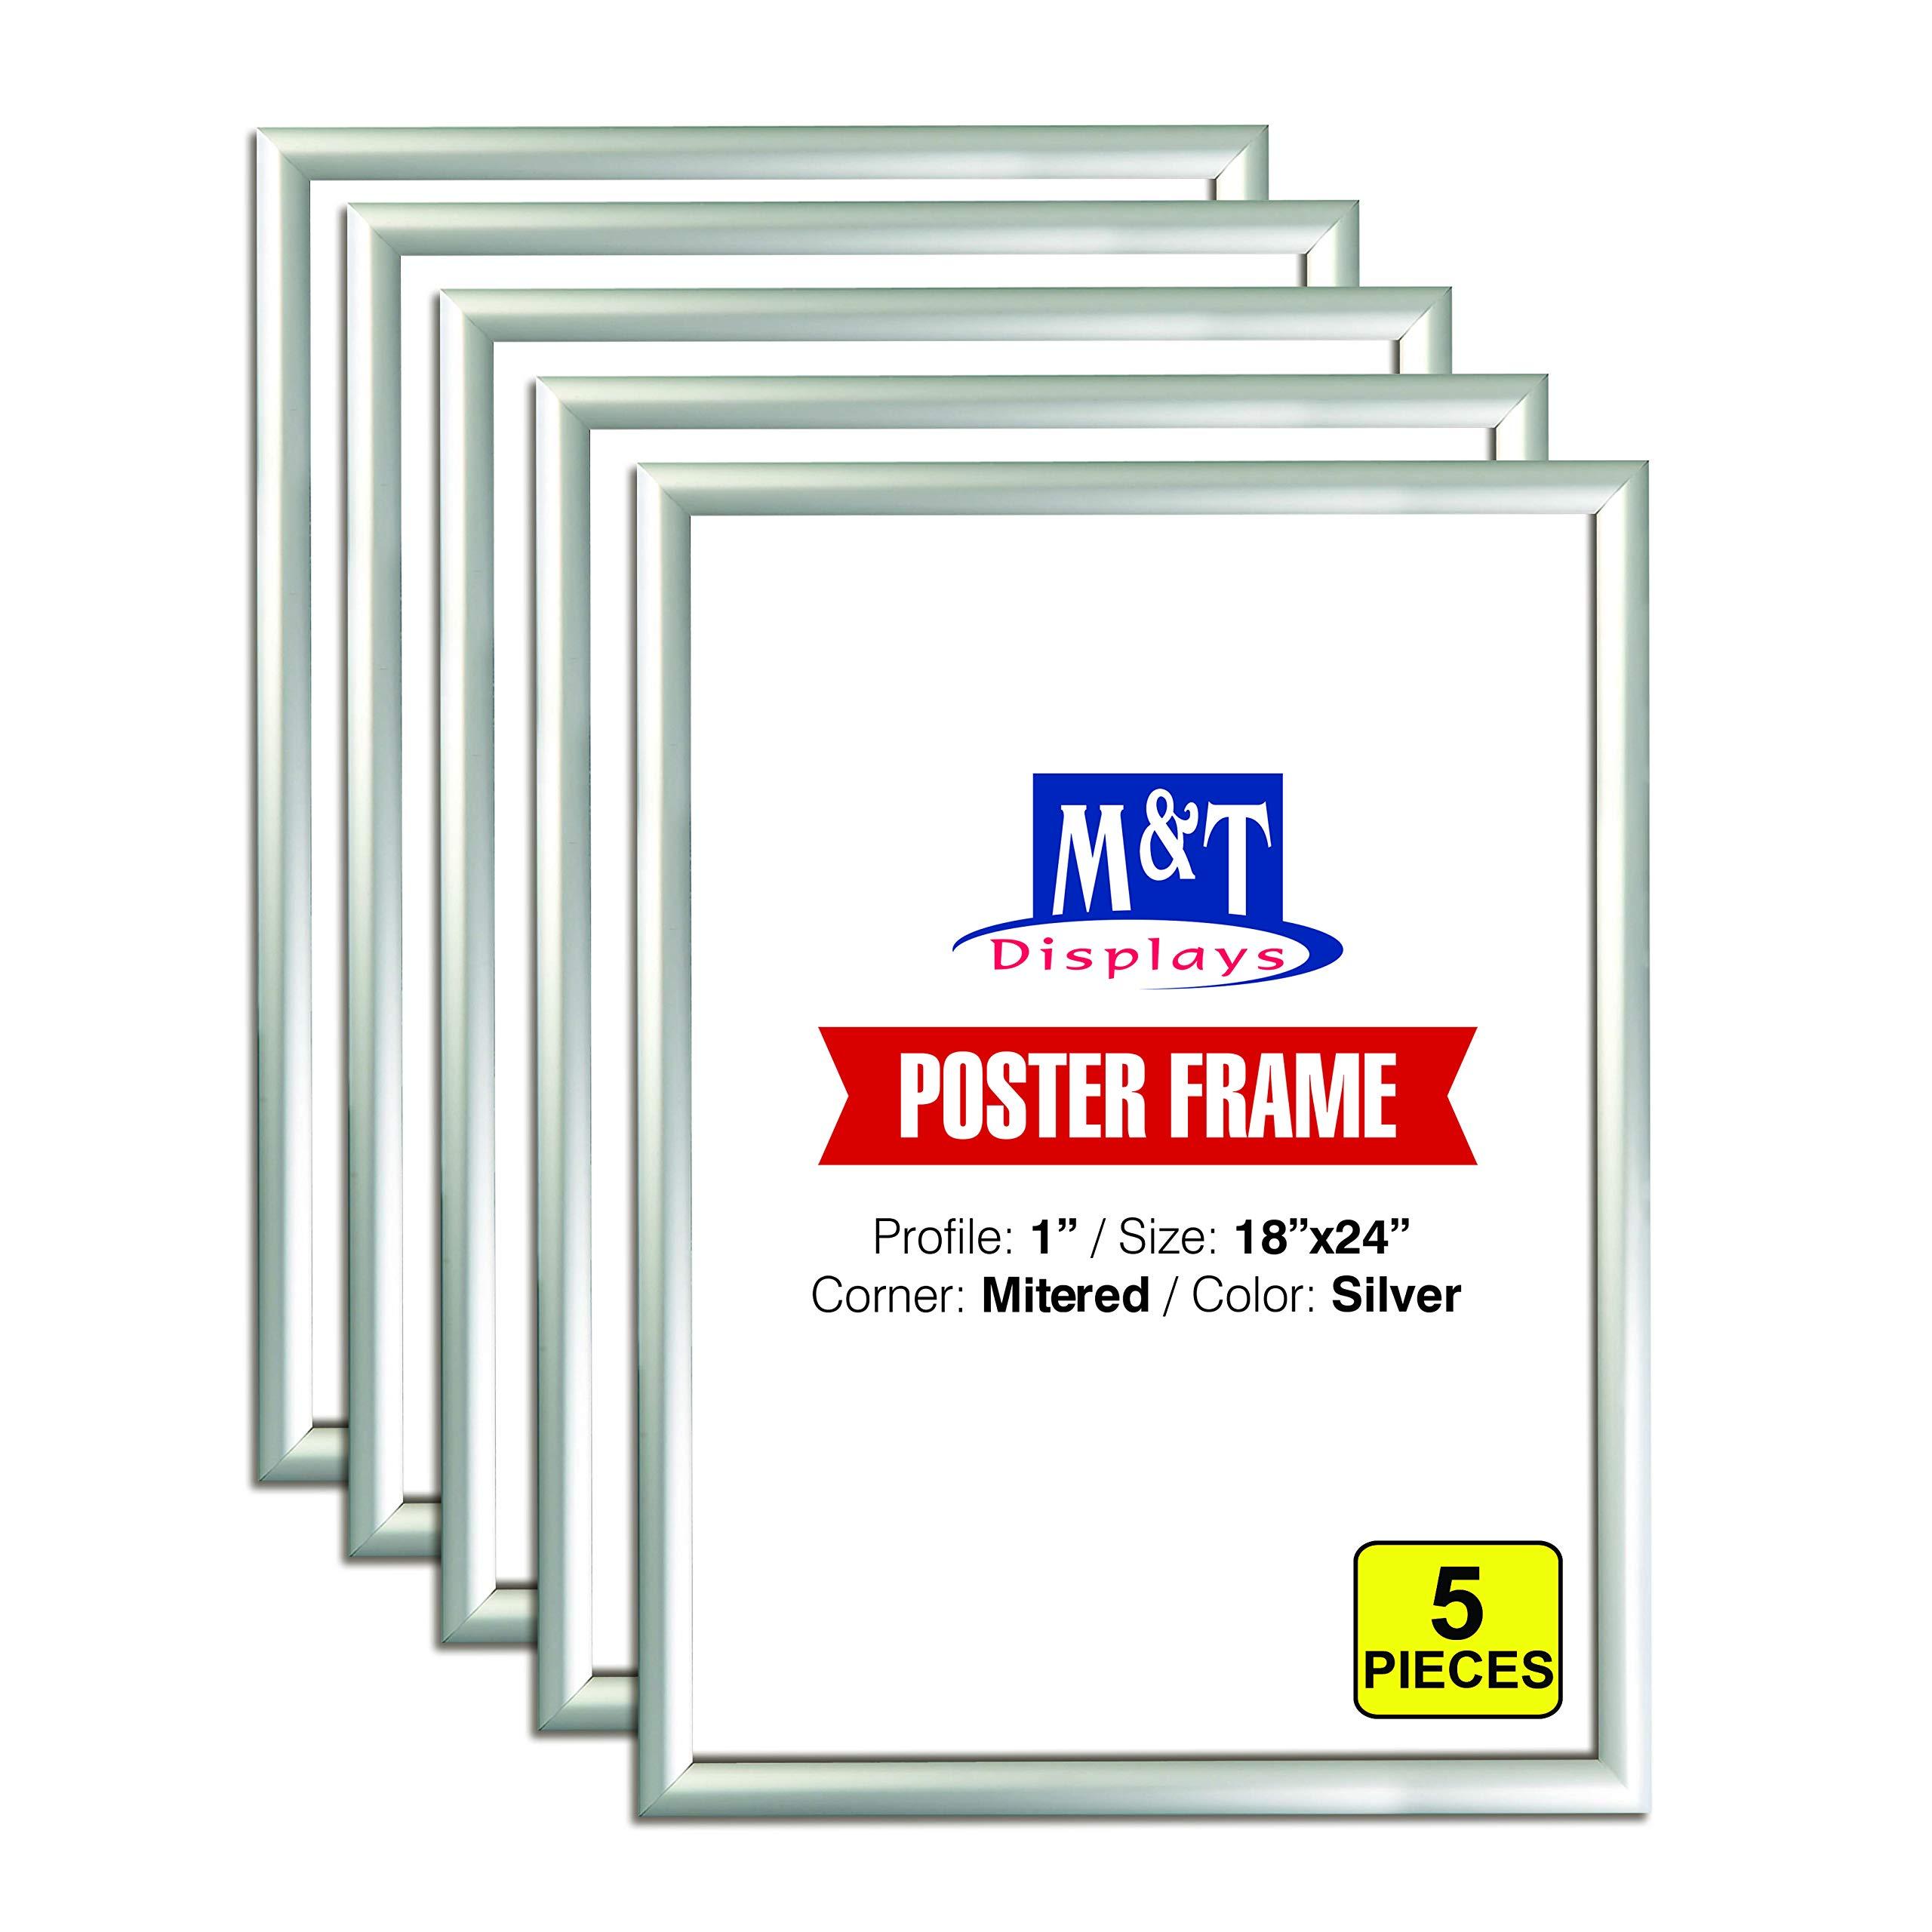 M&T Displays Snap Frame 18x24 Inch Poster Size, 1 Inch Silver Color Aluminum Profile, Front Loading, Mitered Corner (5 Frames)